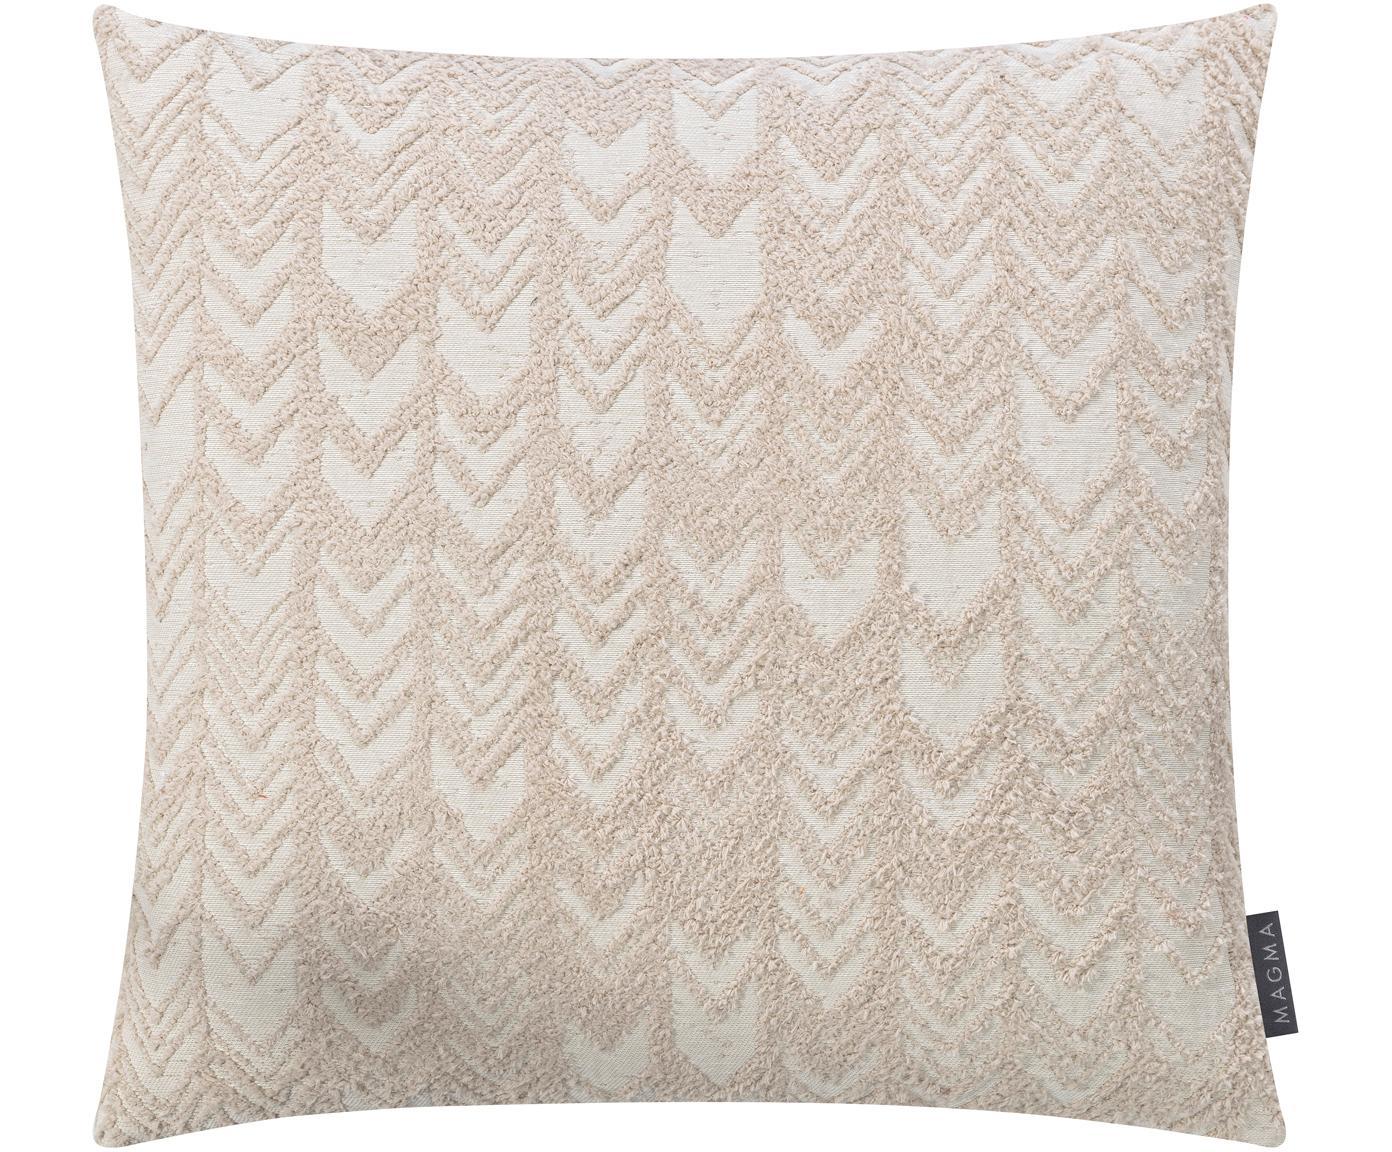 Kussenhoes Tilas met hoog-laag patroon, Weeftechniek: jacquard, Beige, crèmekleurig, 40 x 40 cm